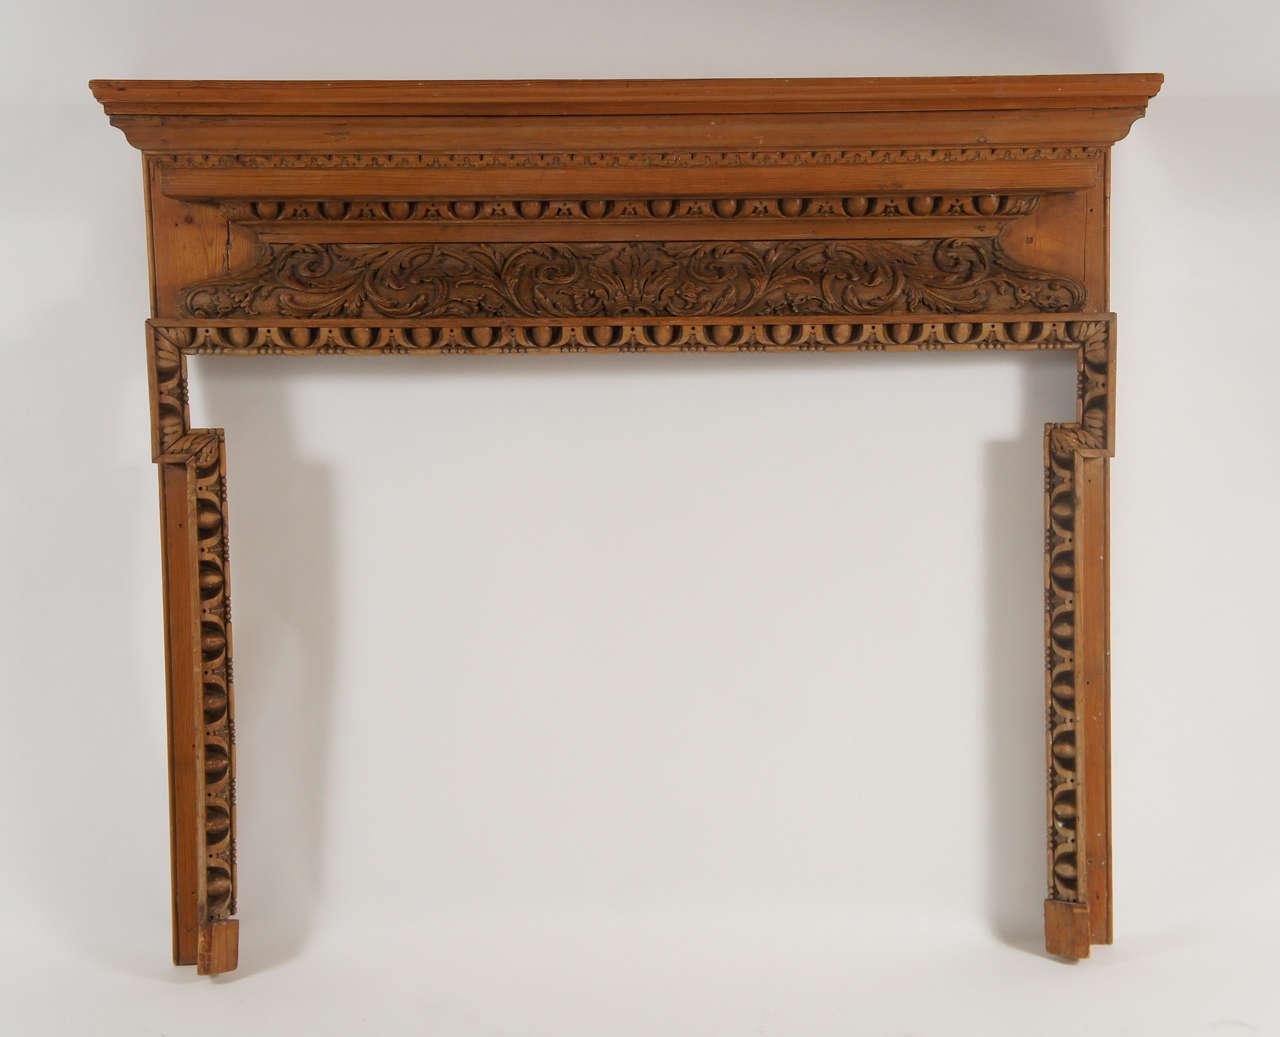 georgian carved pine and lime wood fireplace mantel england